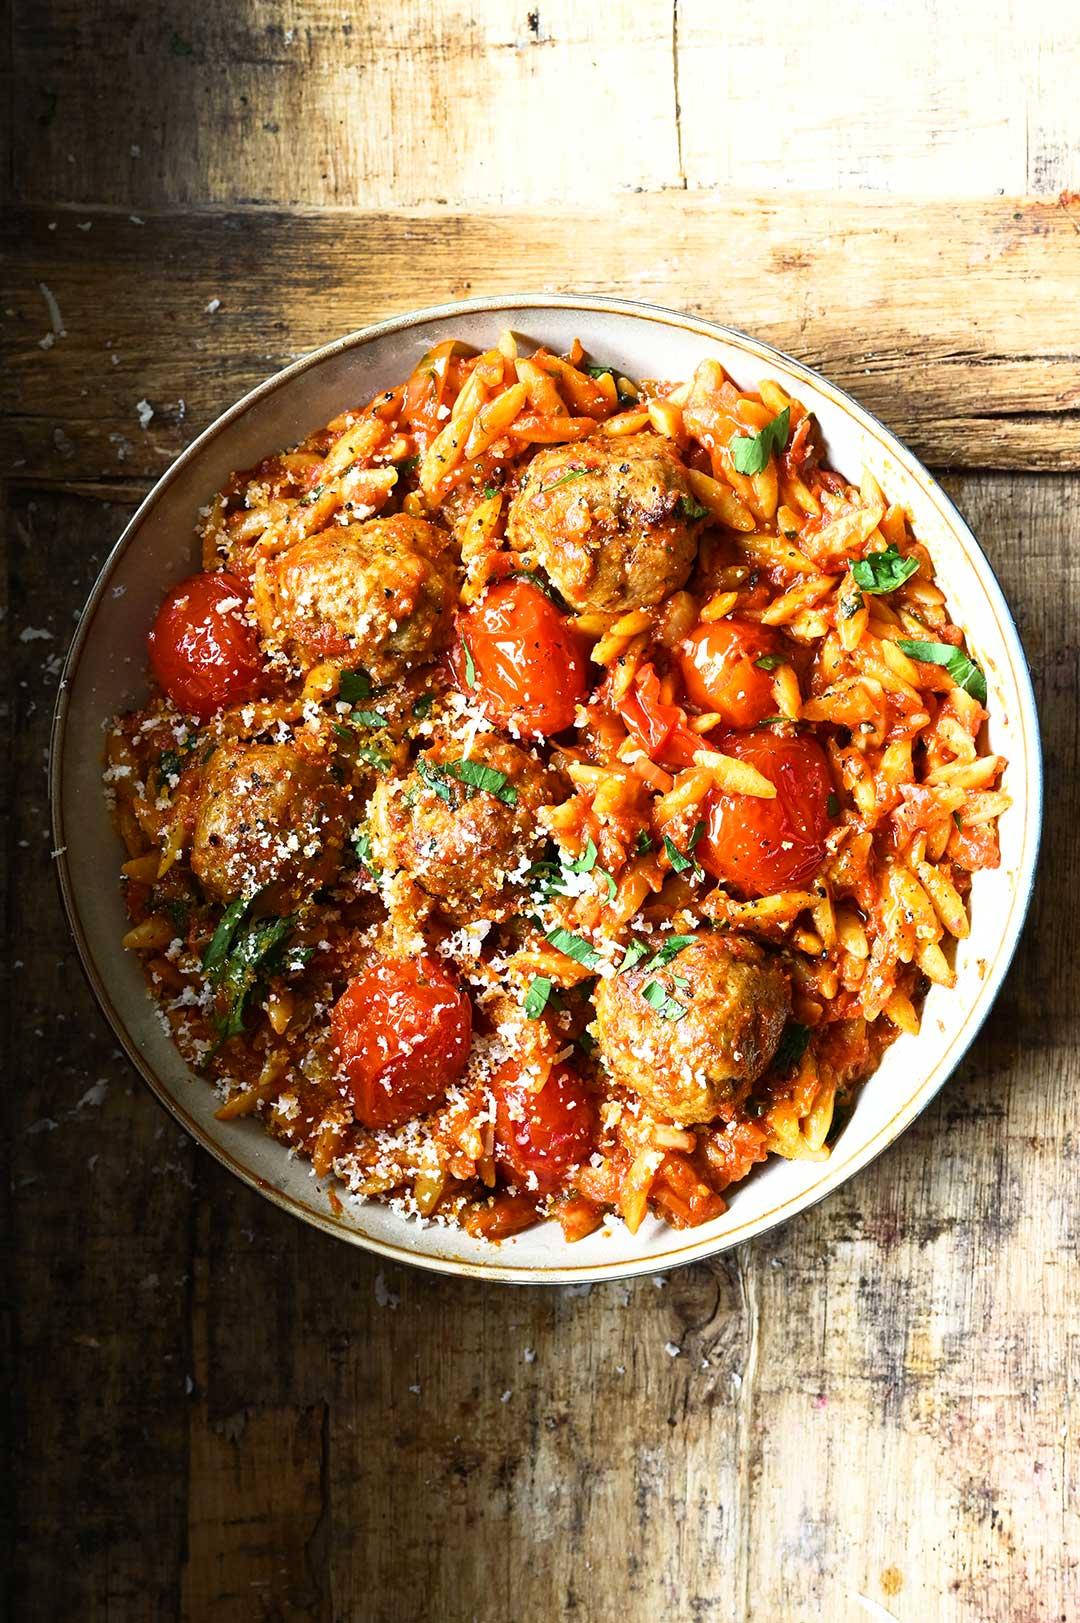 serving dumplings | Pulpety w sosie pomidorowym w orzo